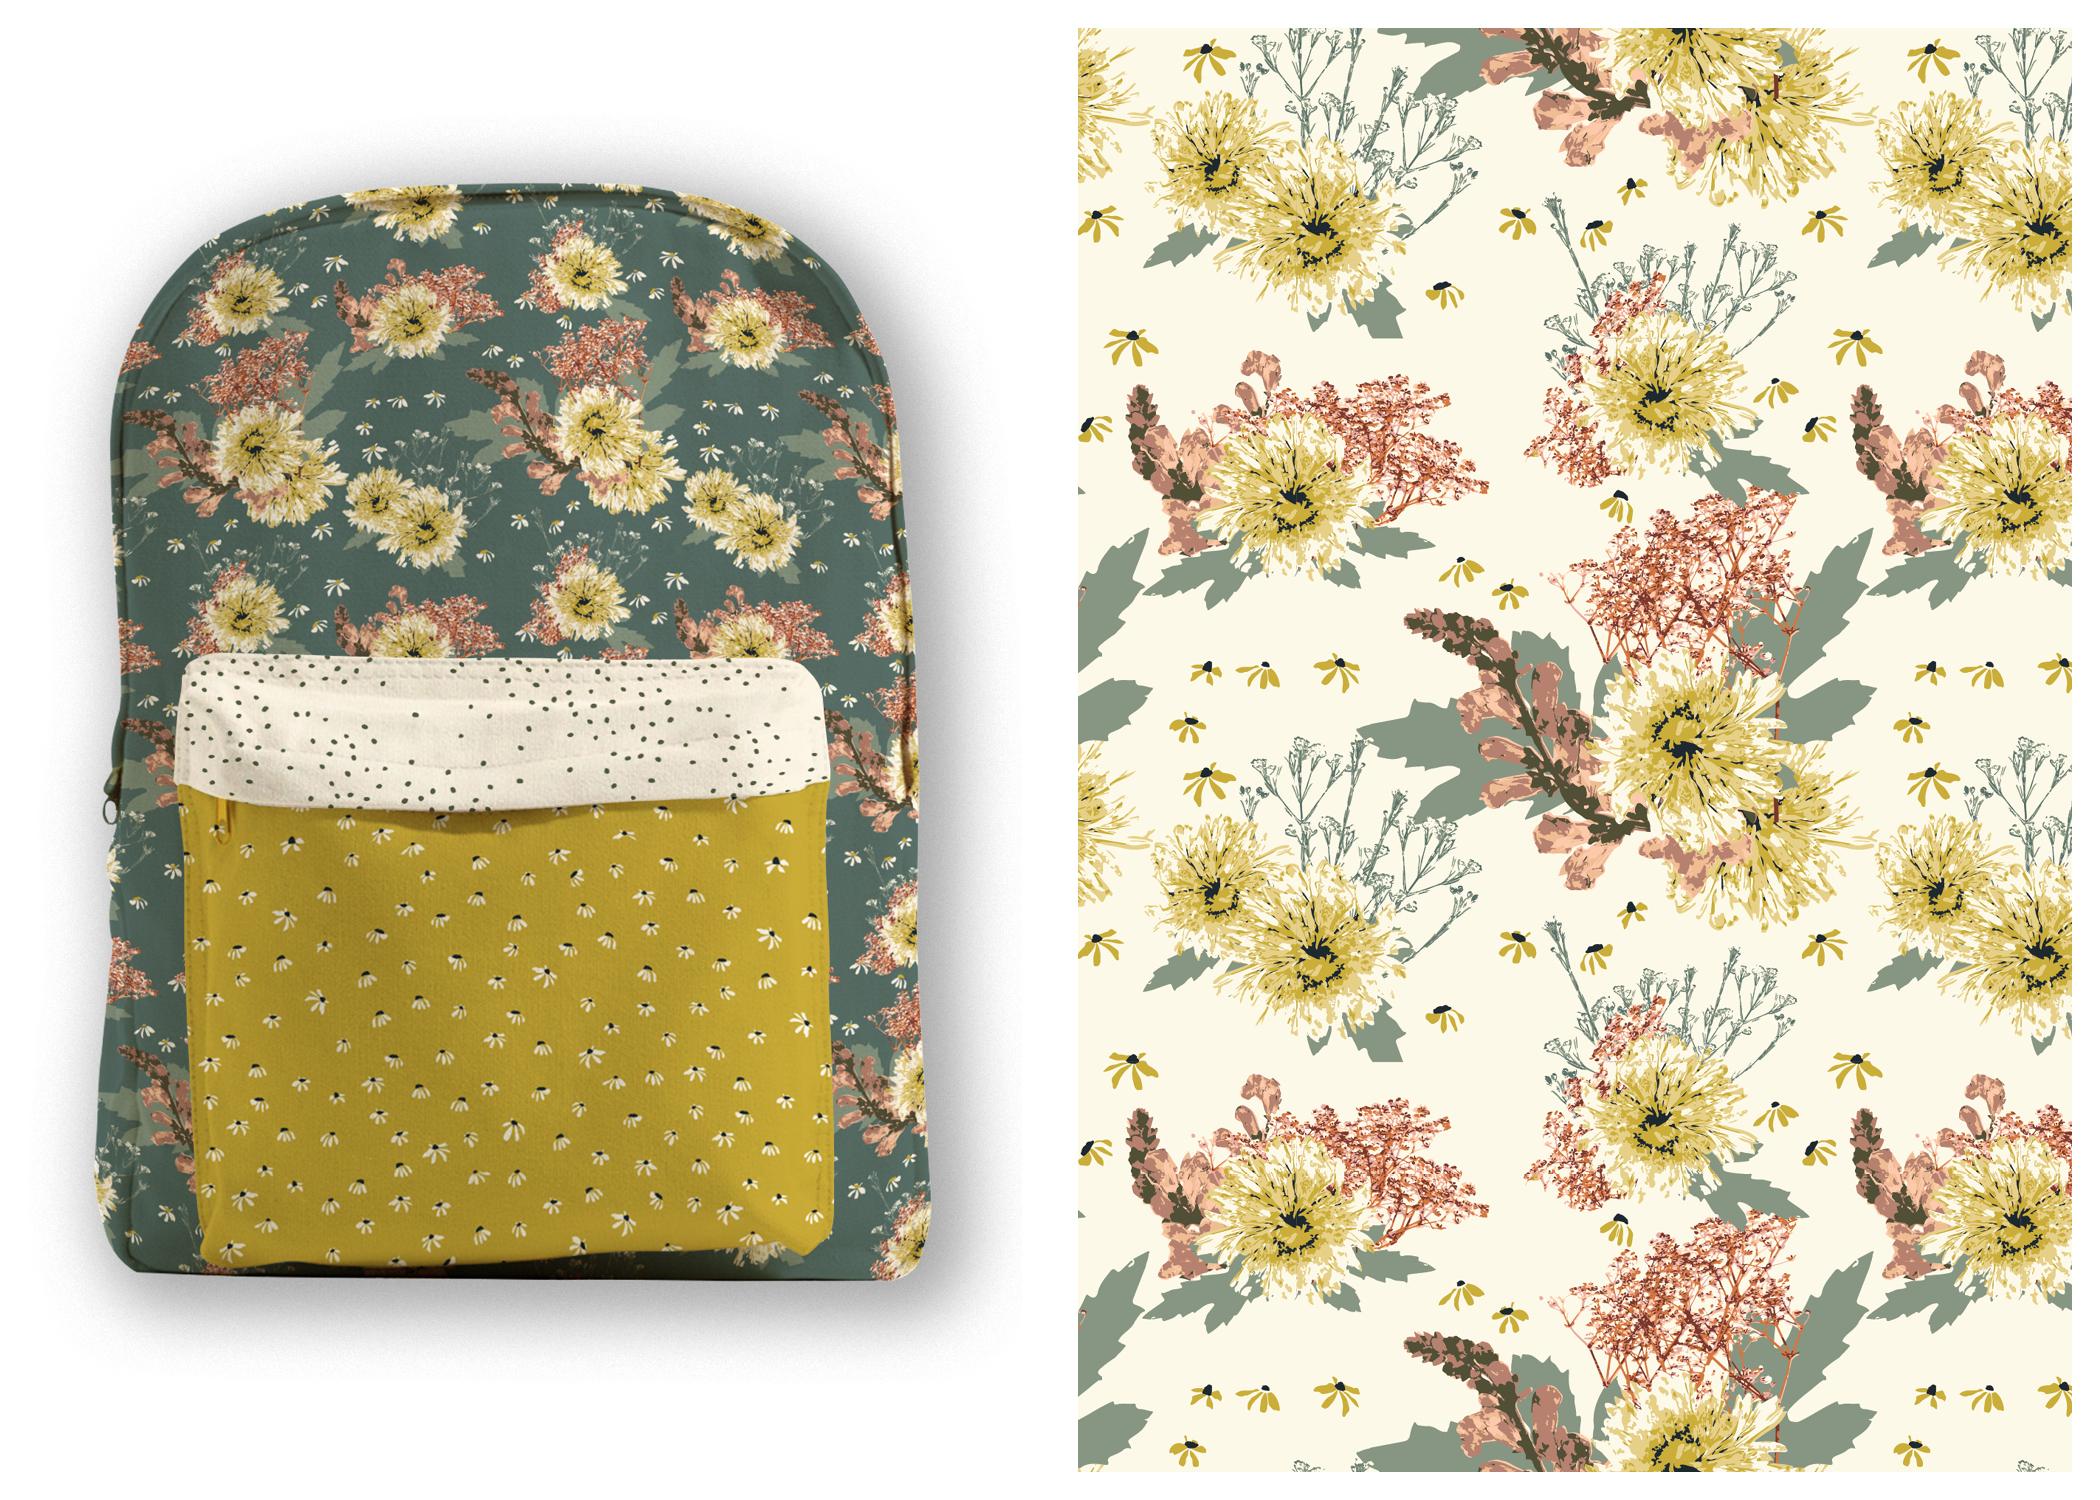 surface pattern design by HOPE johnson9.jpg